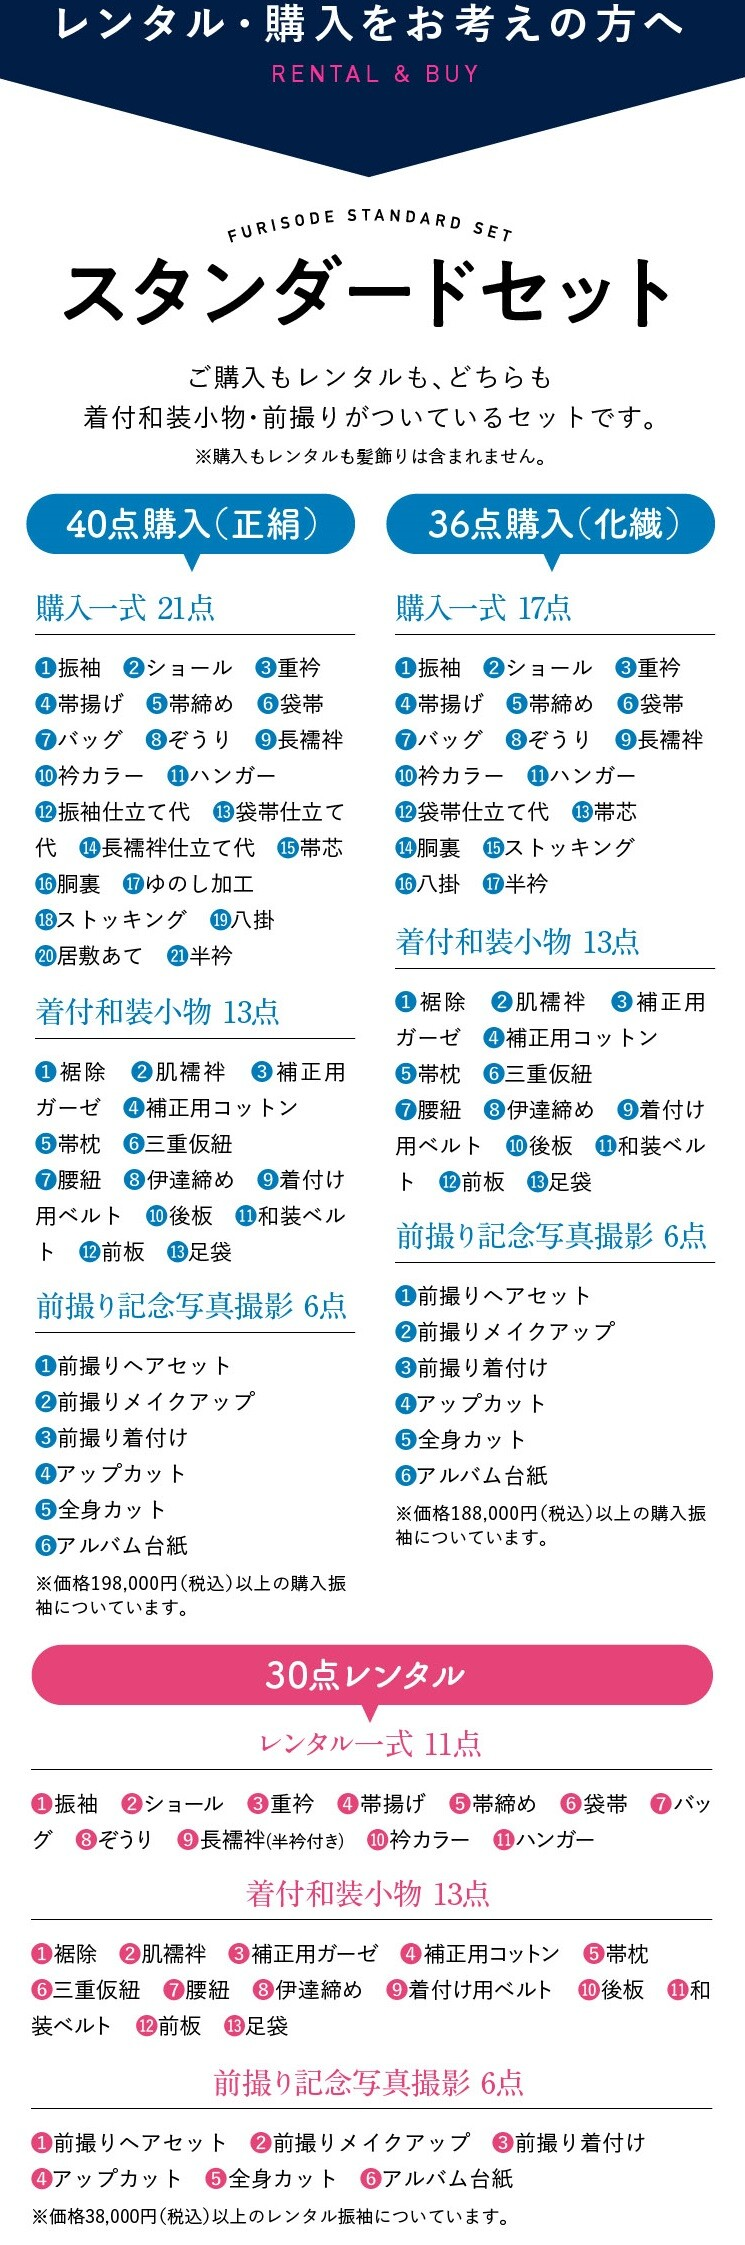 set3LP5-ichikura